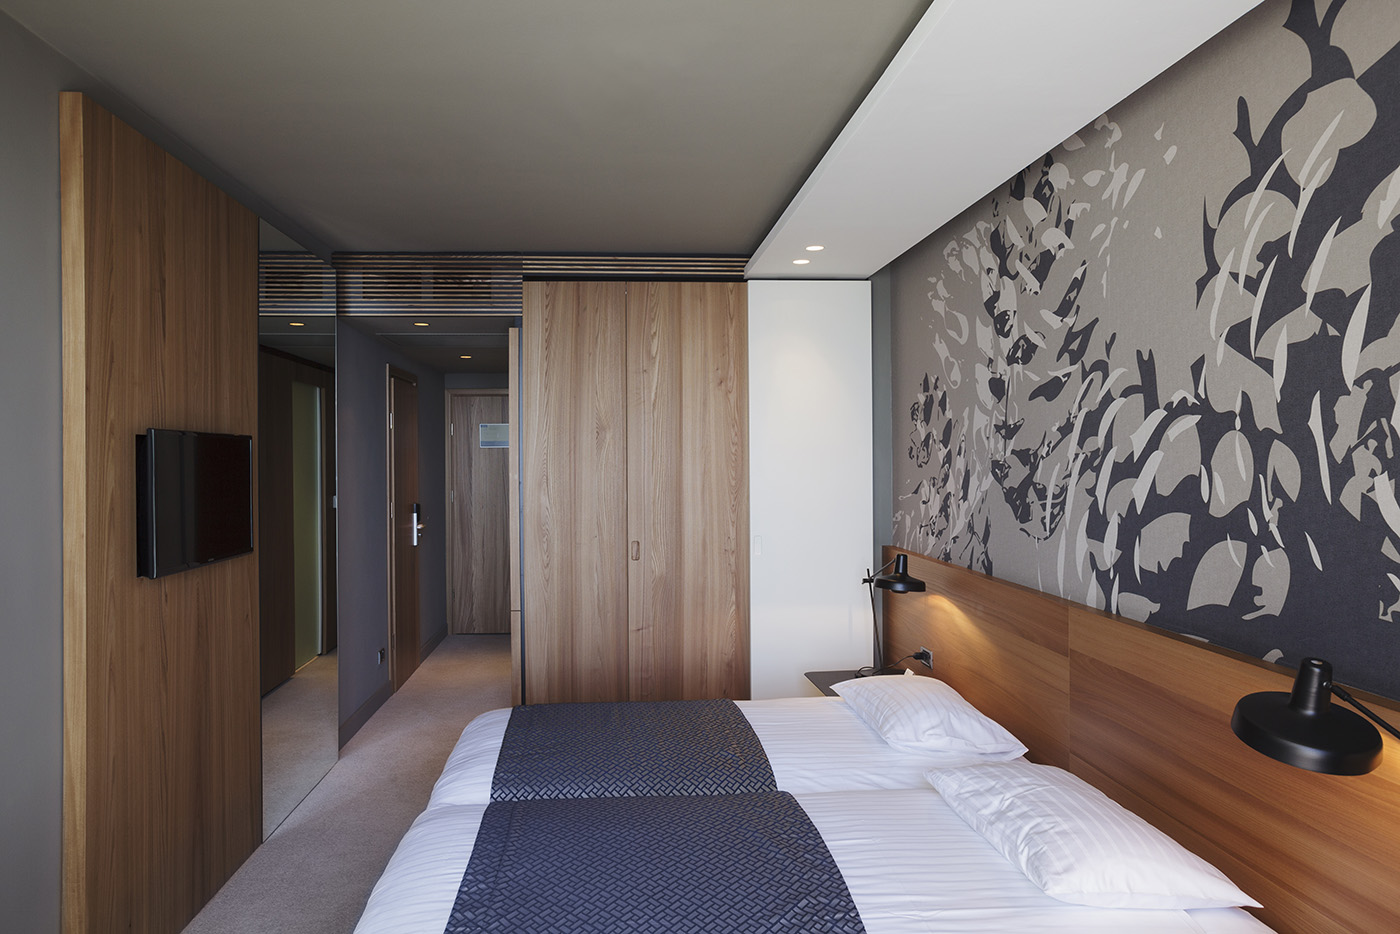 3lhd studio za arhitekturu i urbanizam for Design hotel dubrovnik